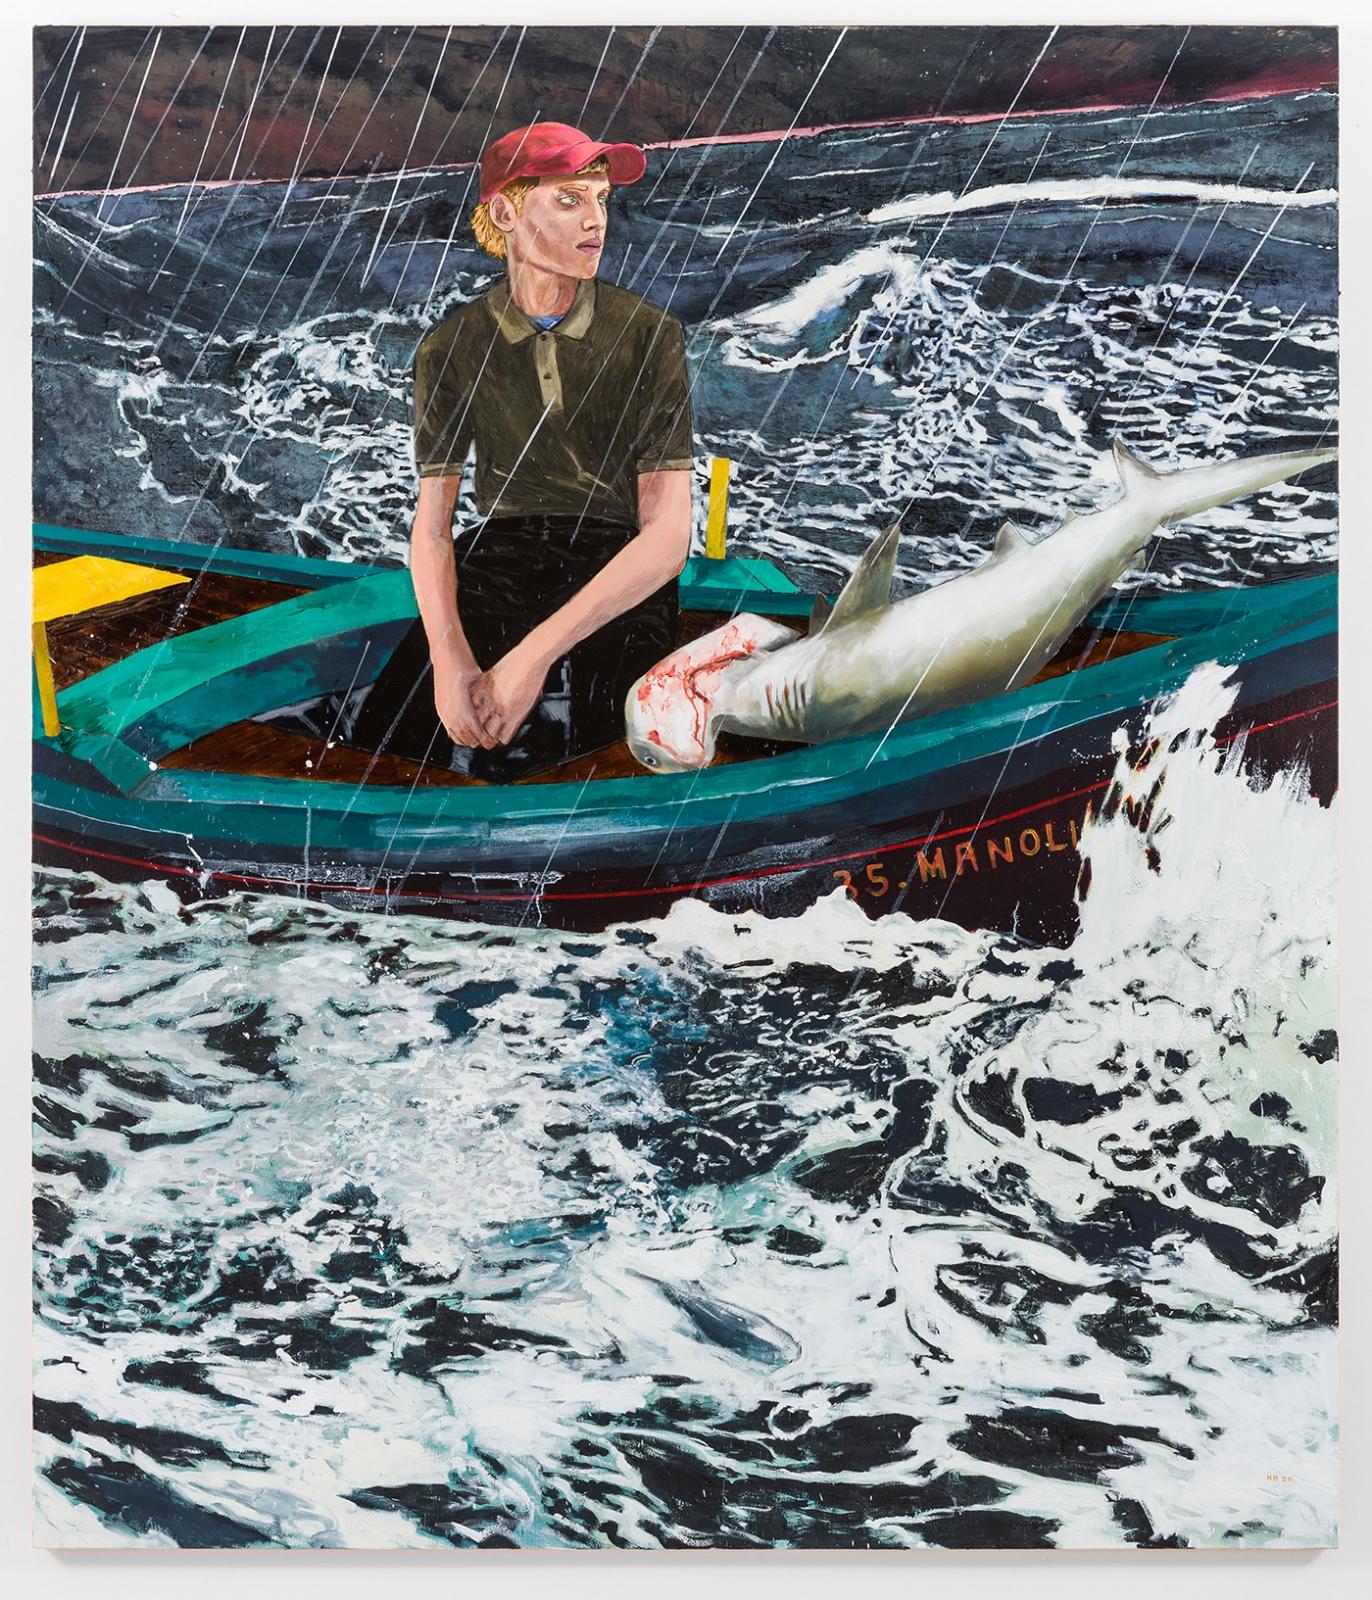 HERNAN BAS, The Young Man & the Sea, 2020